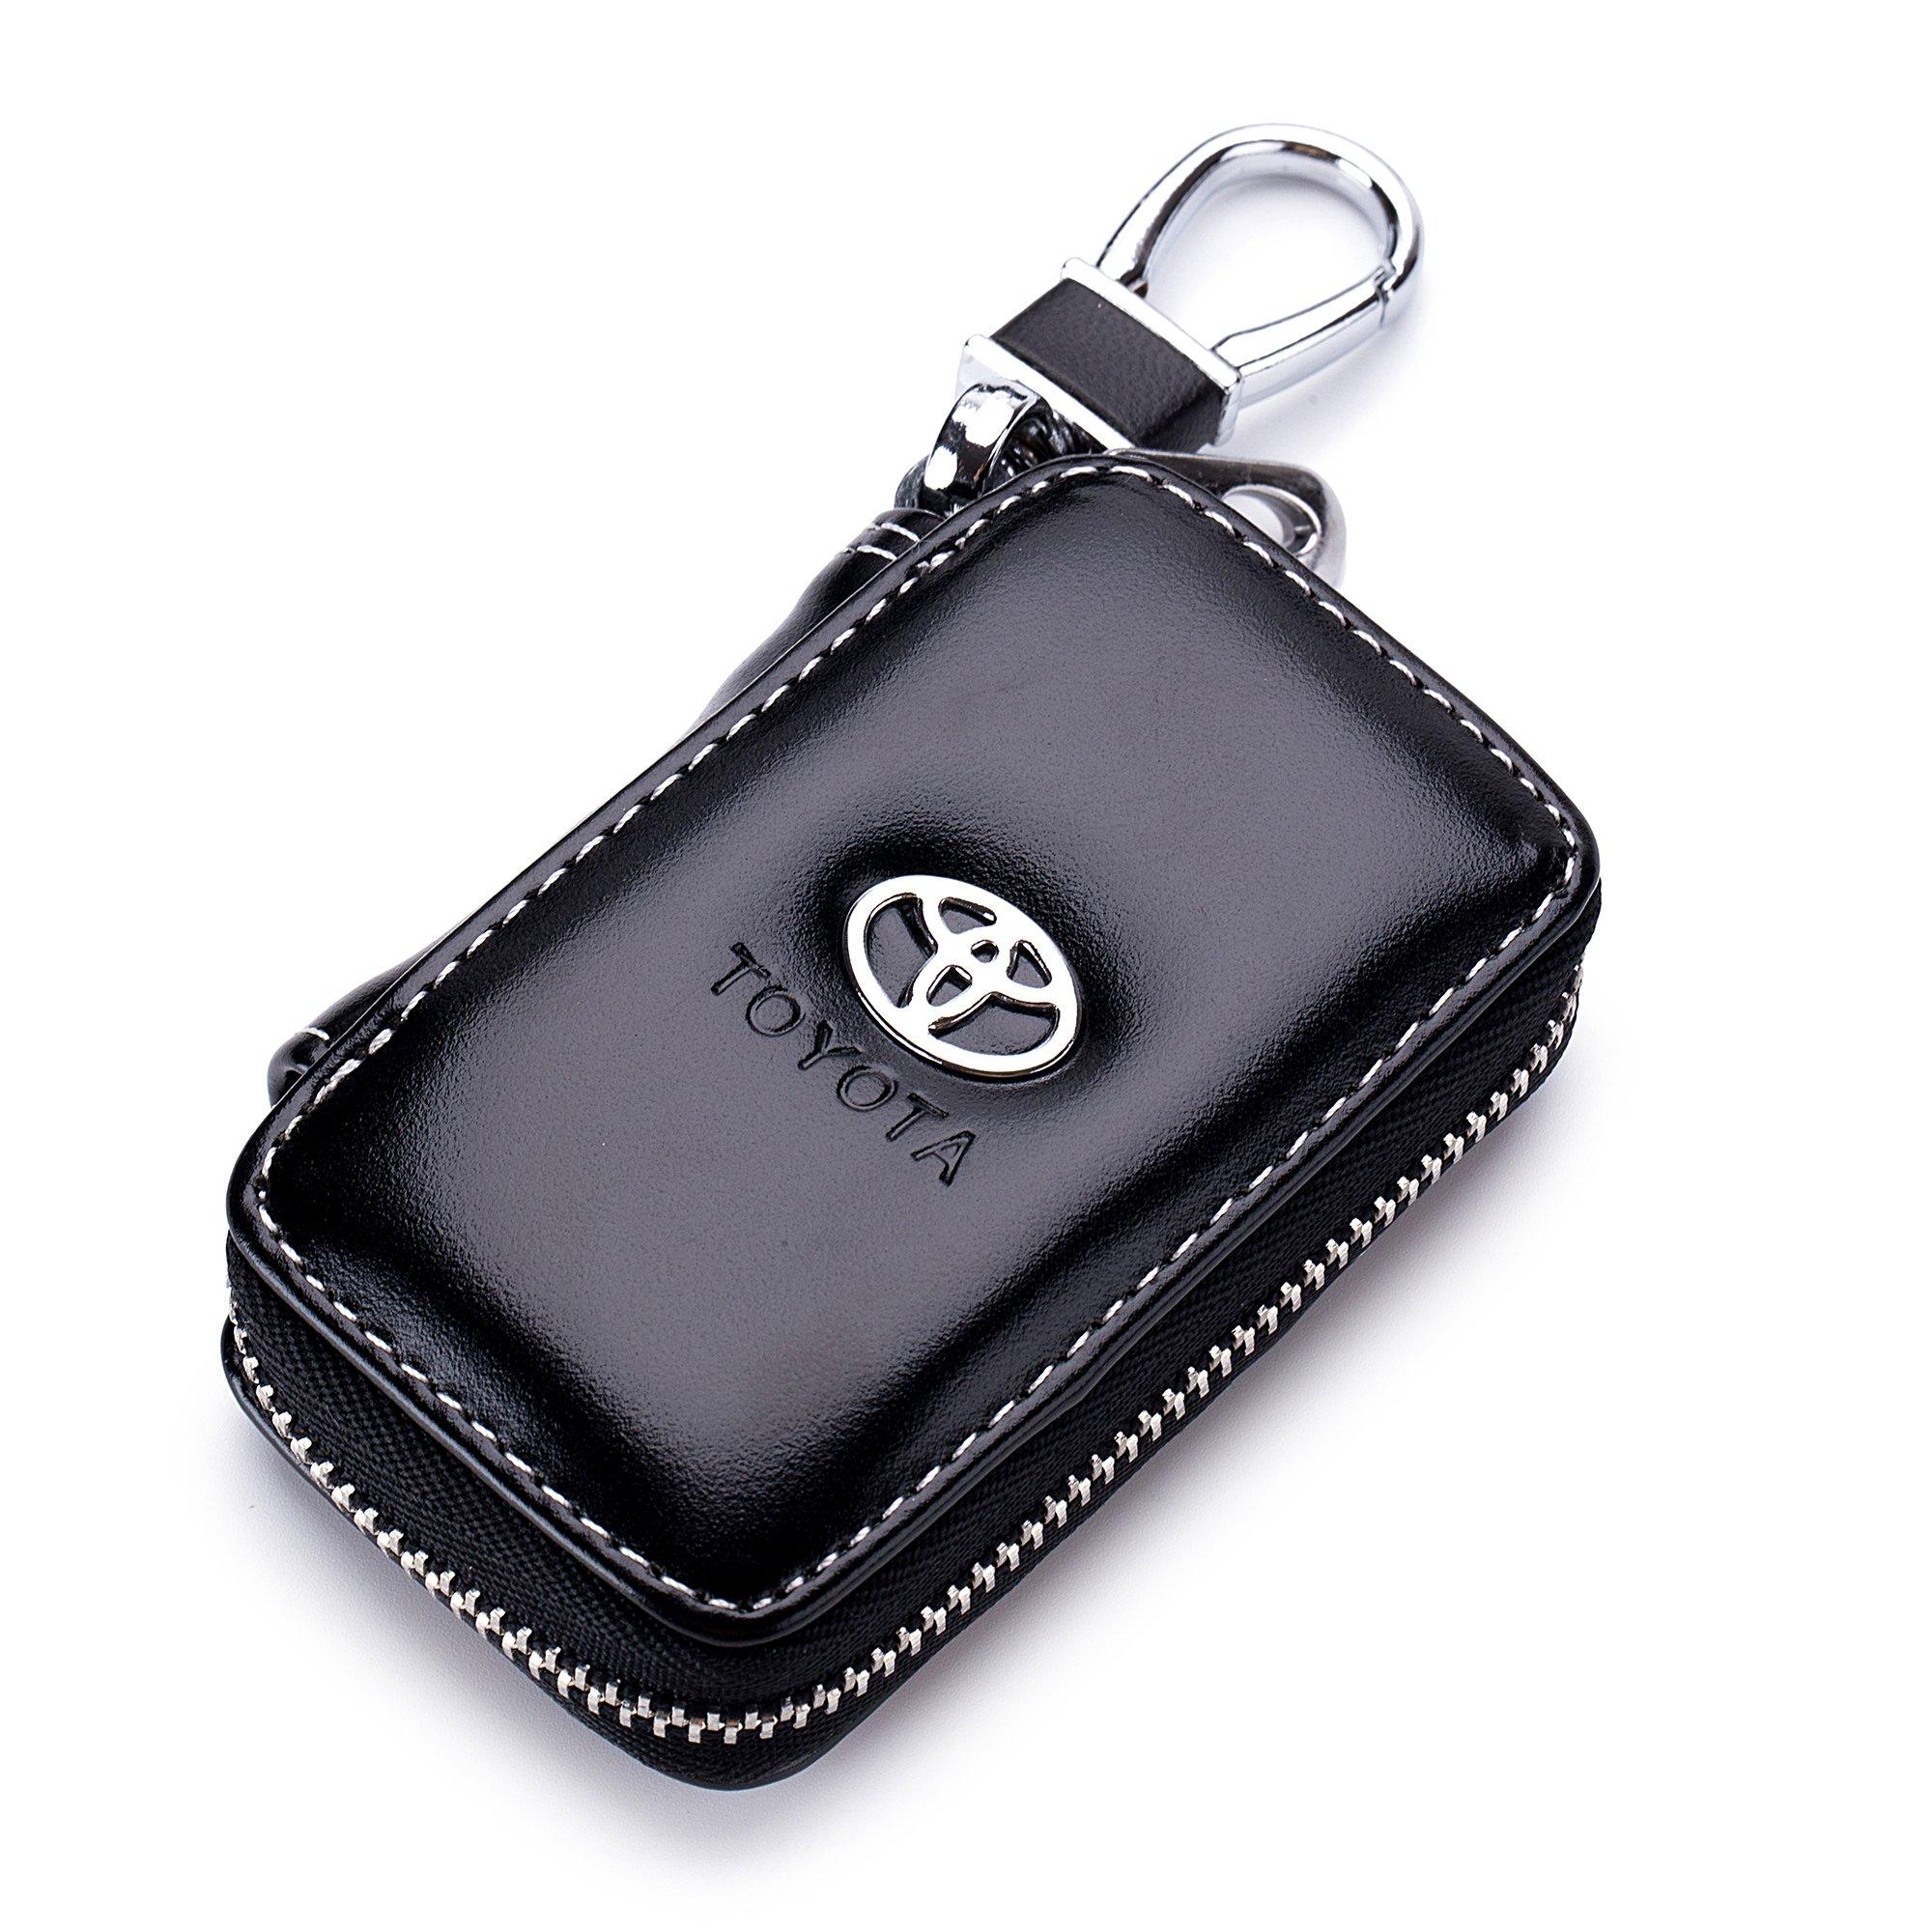 QZS Toyota Leather Holder Zipper